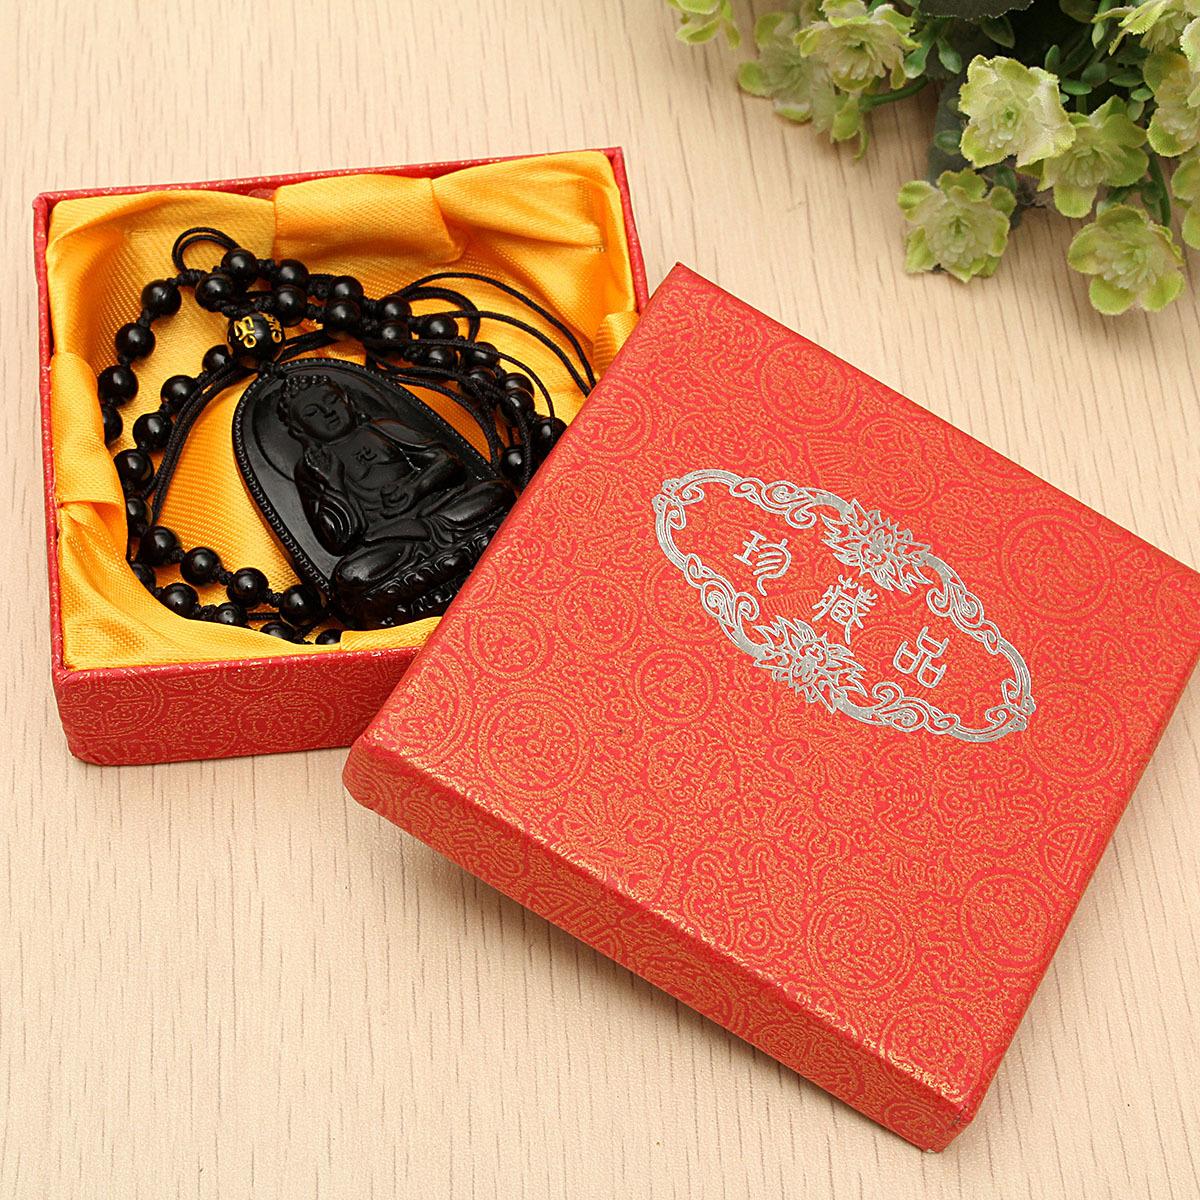 ... Alam Chisese yang hitam seperti batu Obsidian ukiran budha beruntung Amulet liontin Nacklace Internasional